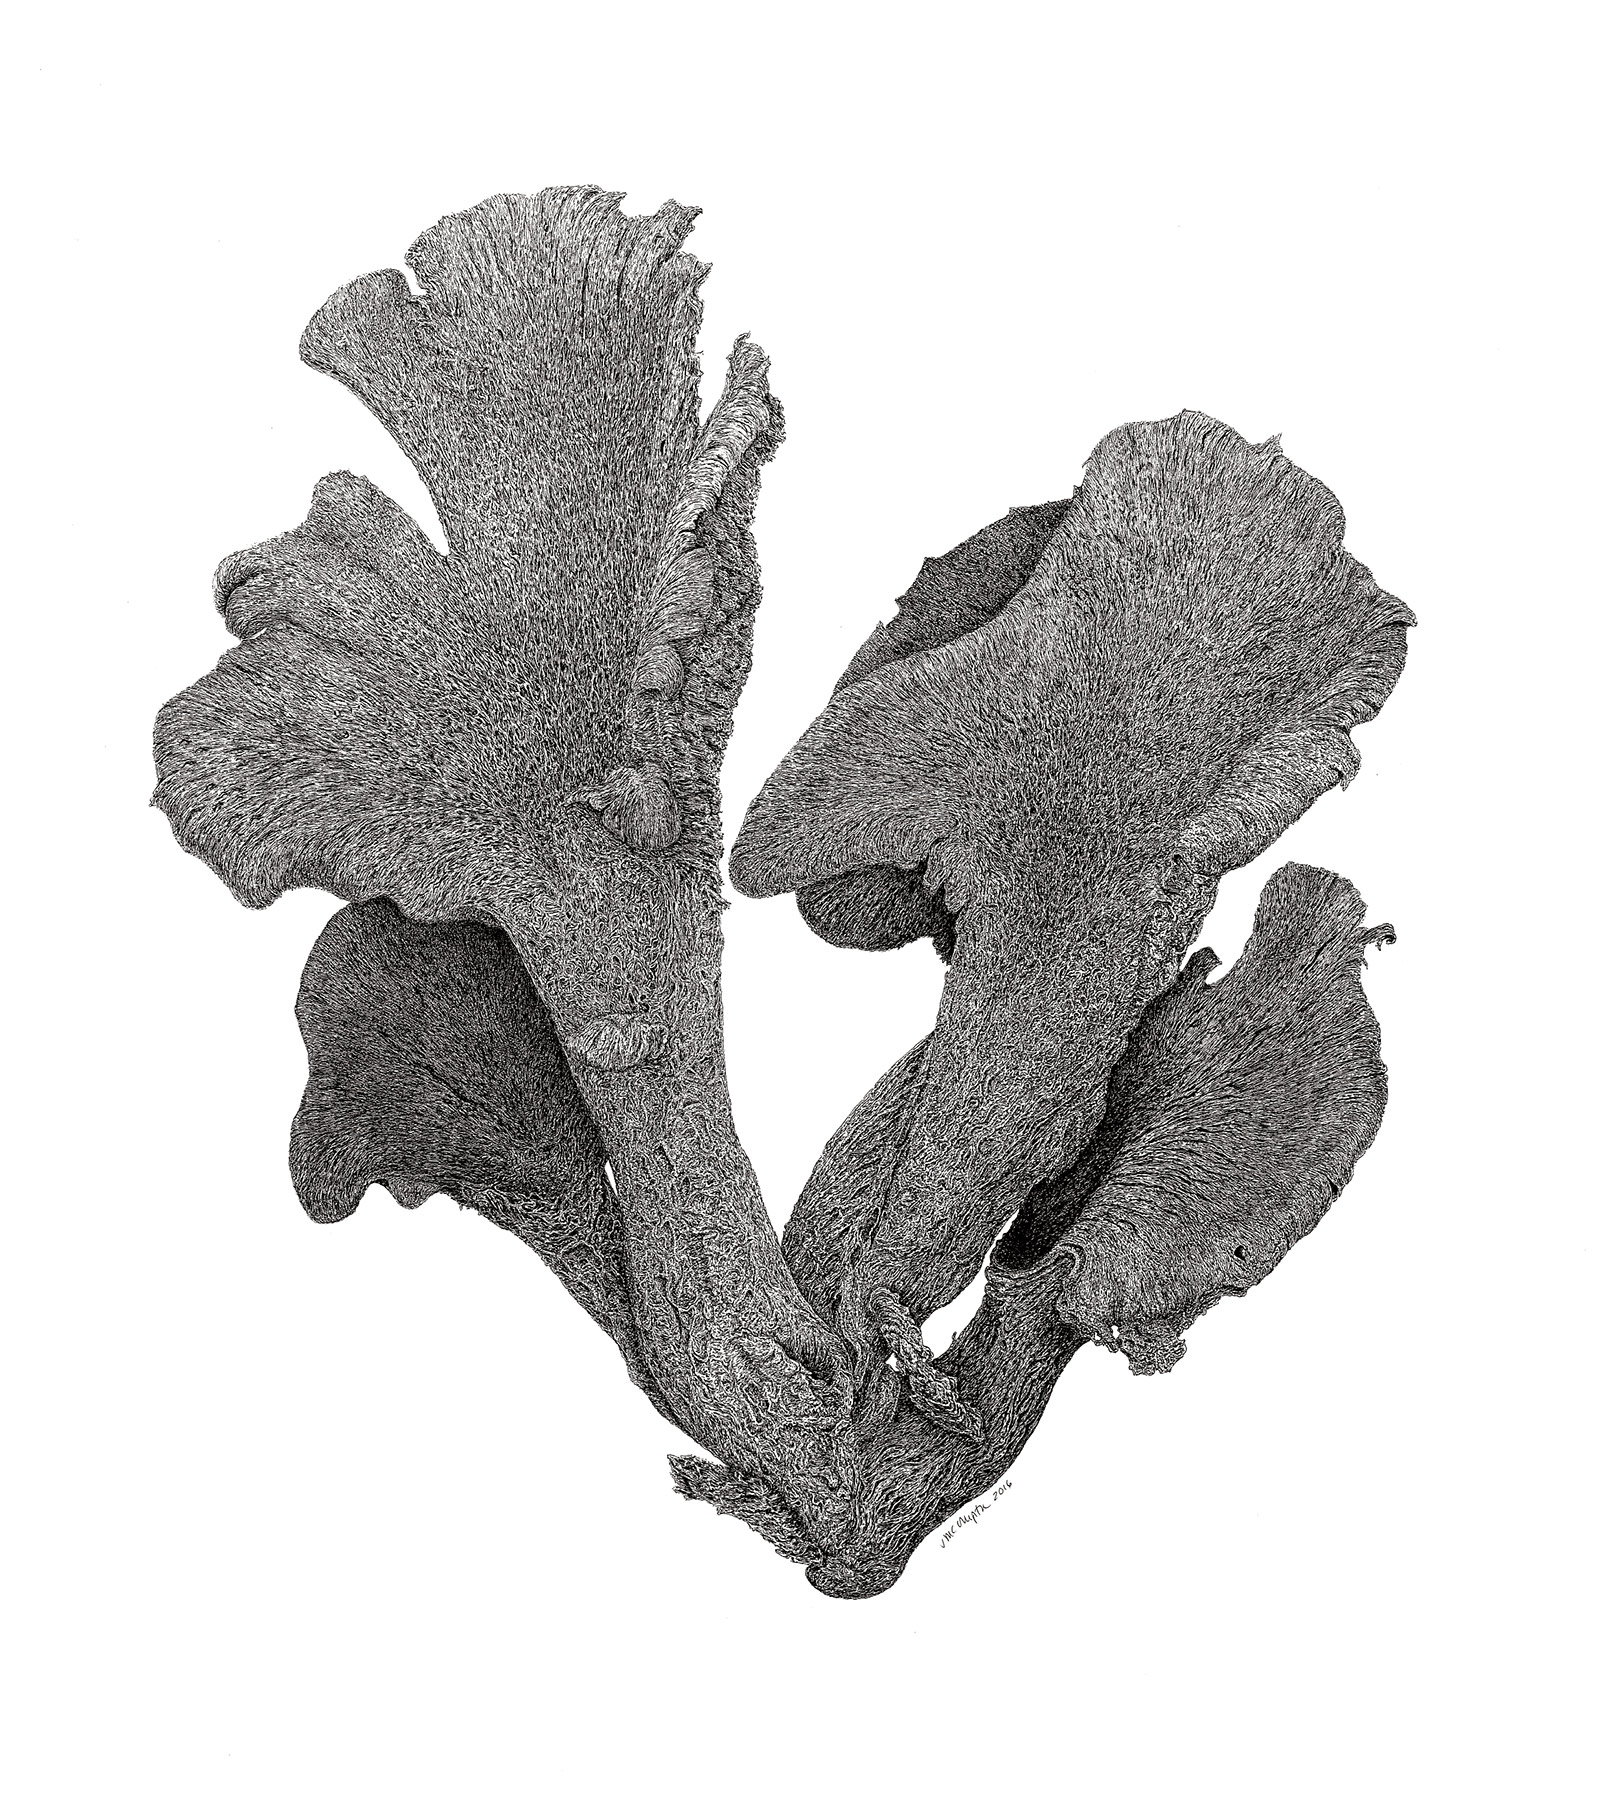 Whitneyvill Fungus Pen & Ink - Jeanette